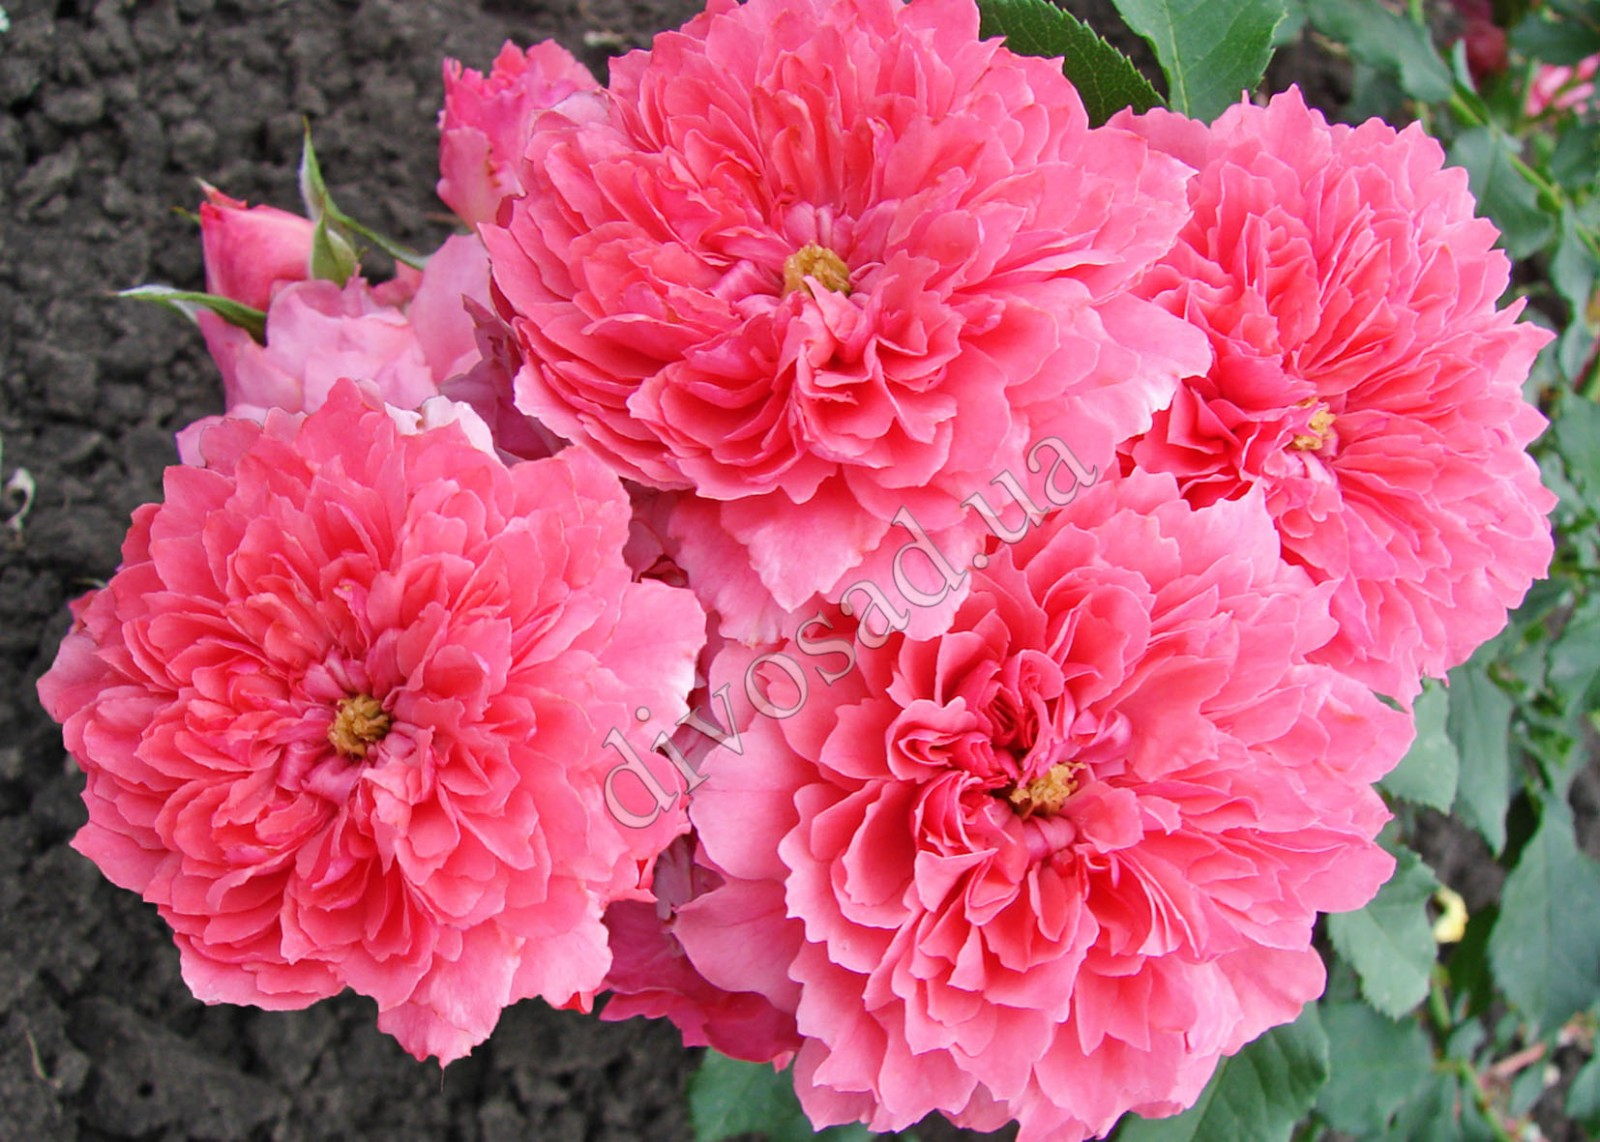 Rosarium uetersen роза плетистая 6